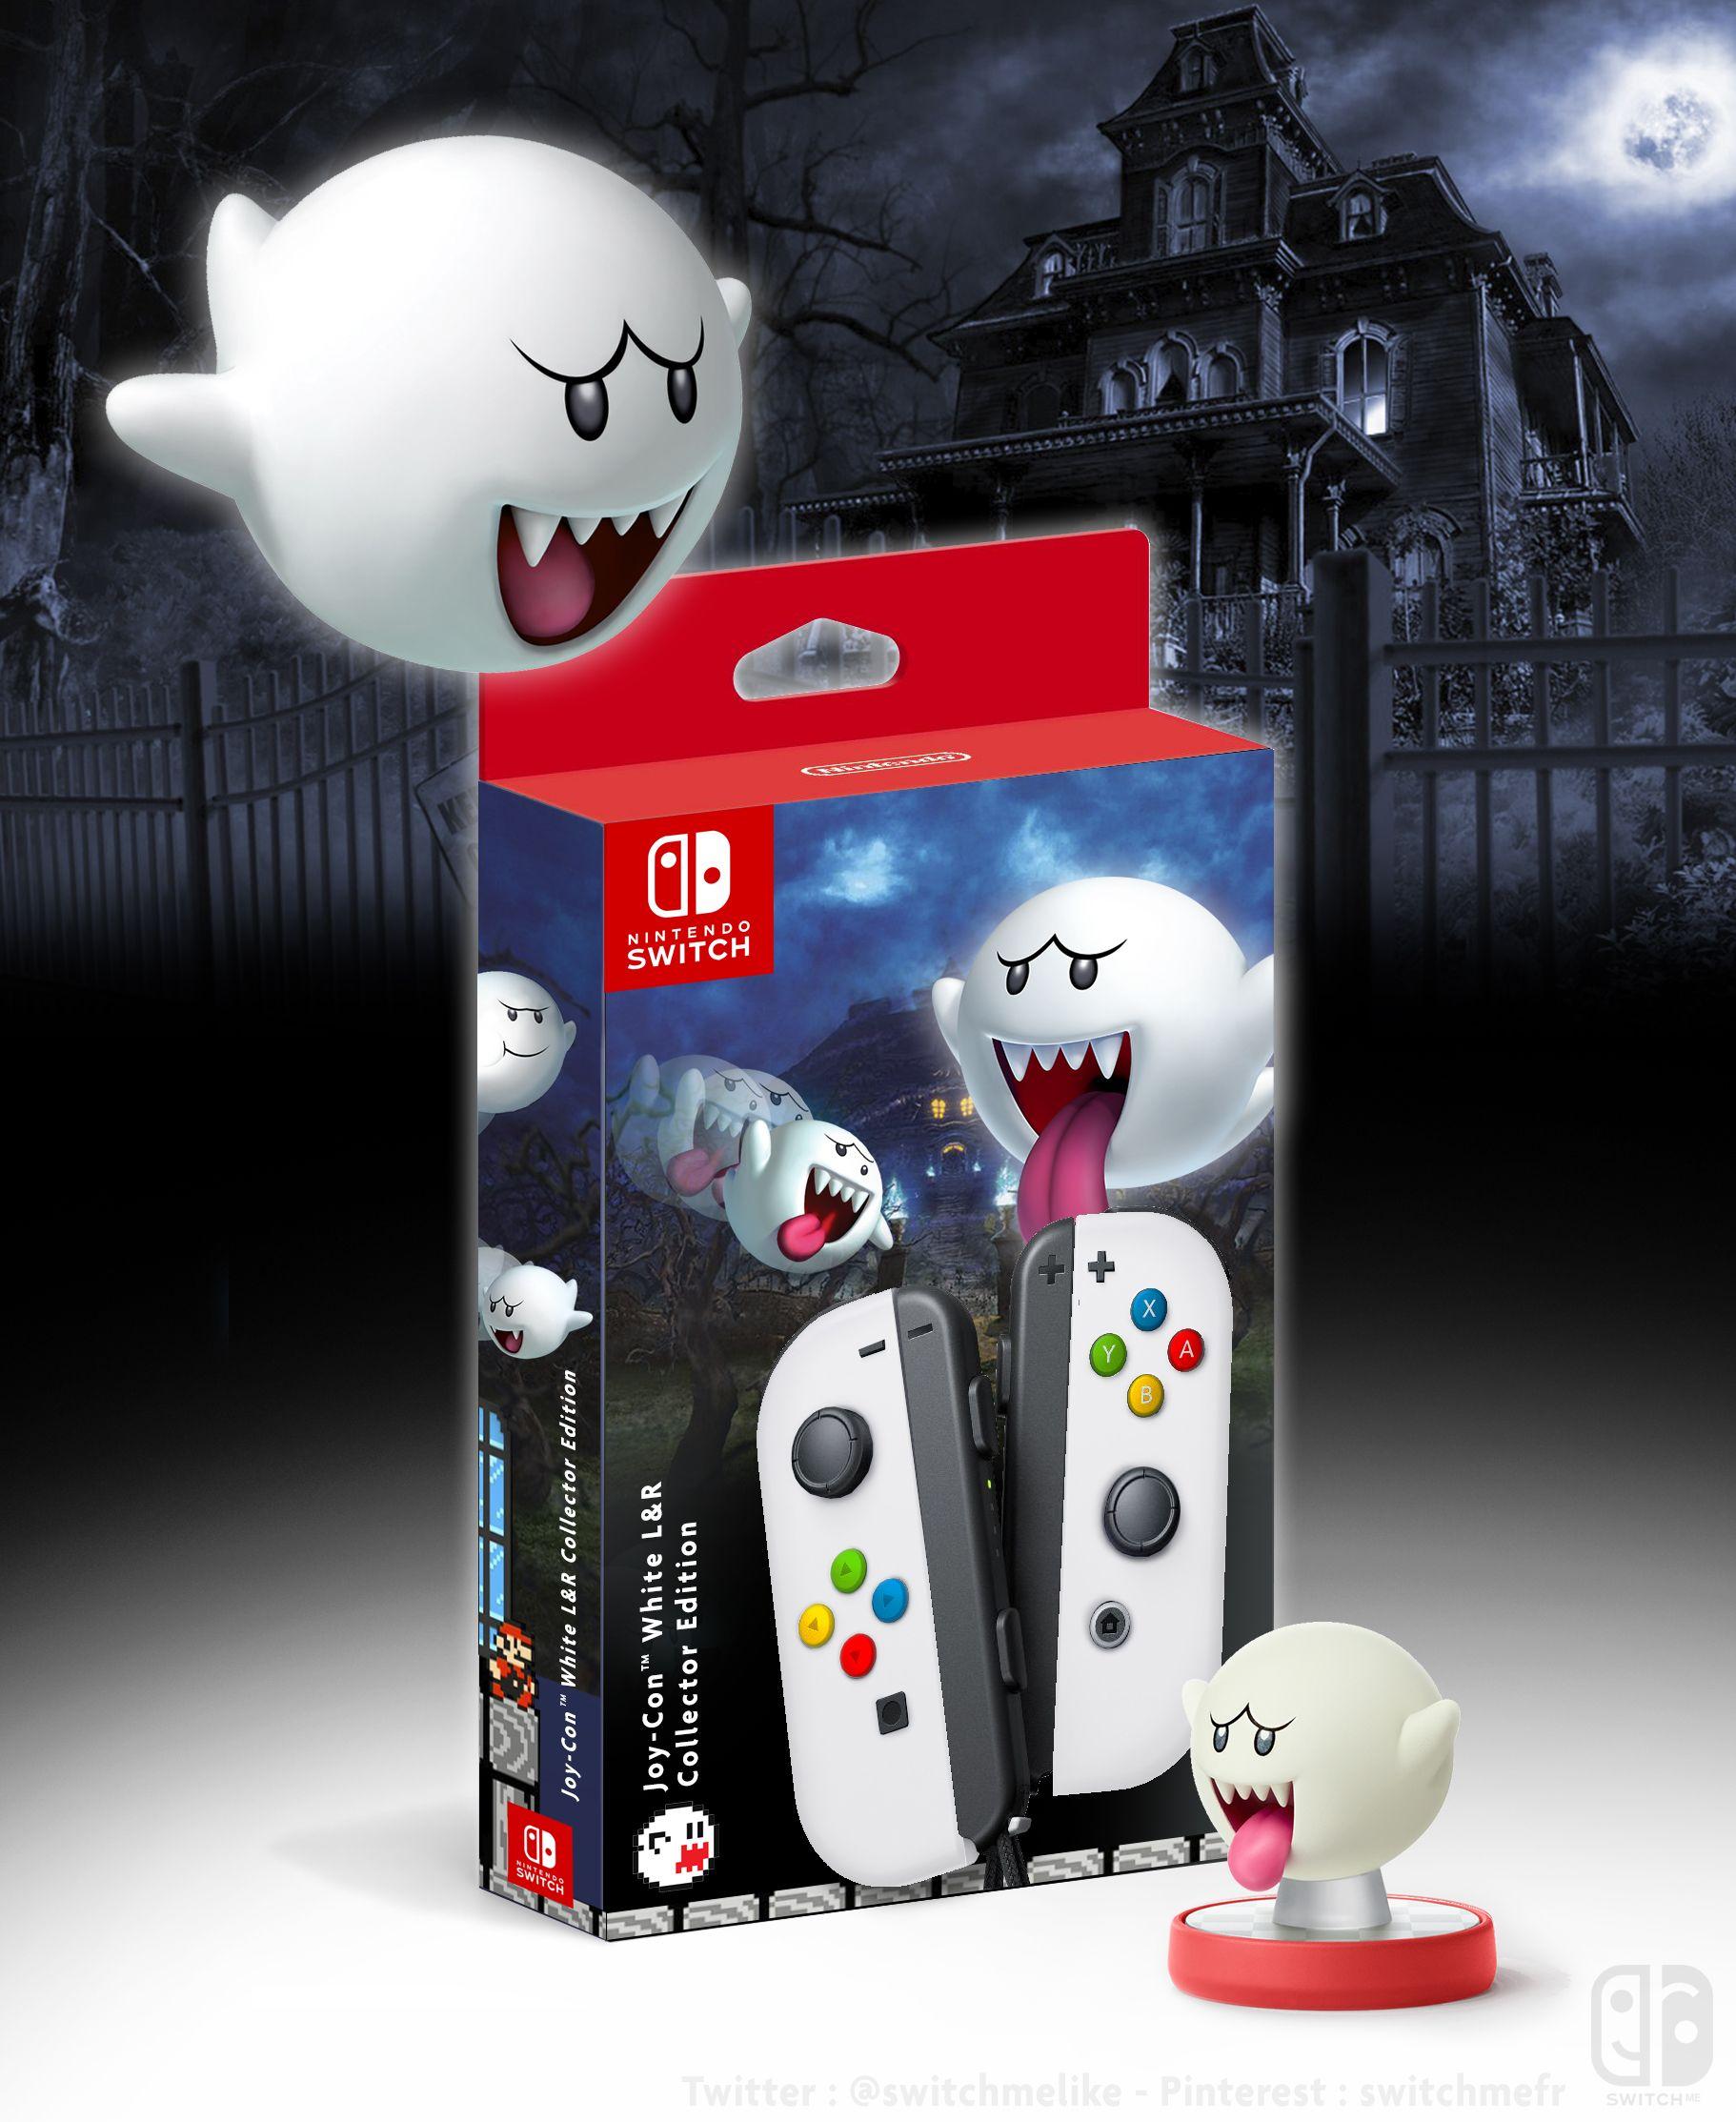 Joy Con Collector White Color Amiibo Boo Nintendo Switch A Switch Me Fan Art If U Like It Fol Nintendo Switch Accessories Nintendo Switch Games Nintendo